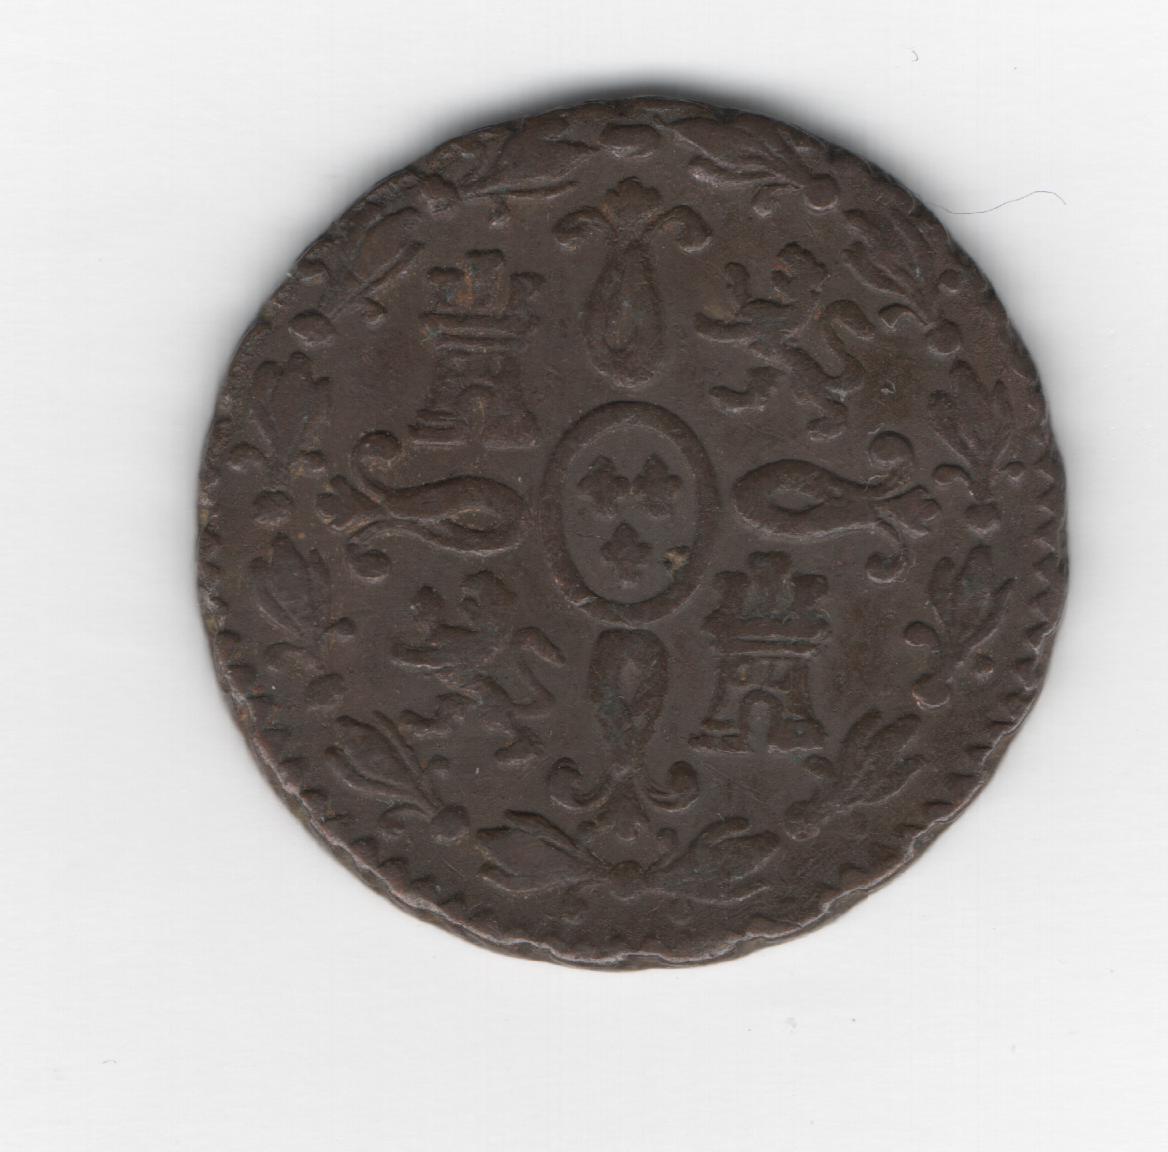 2 Maravedis 1831 Fernando VII Segovia 2_maravedis_1831_Segovia_B_2_44gr_18_7mm